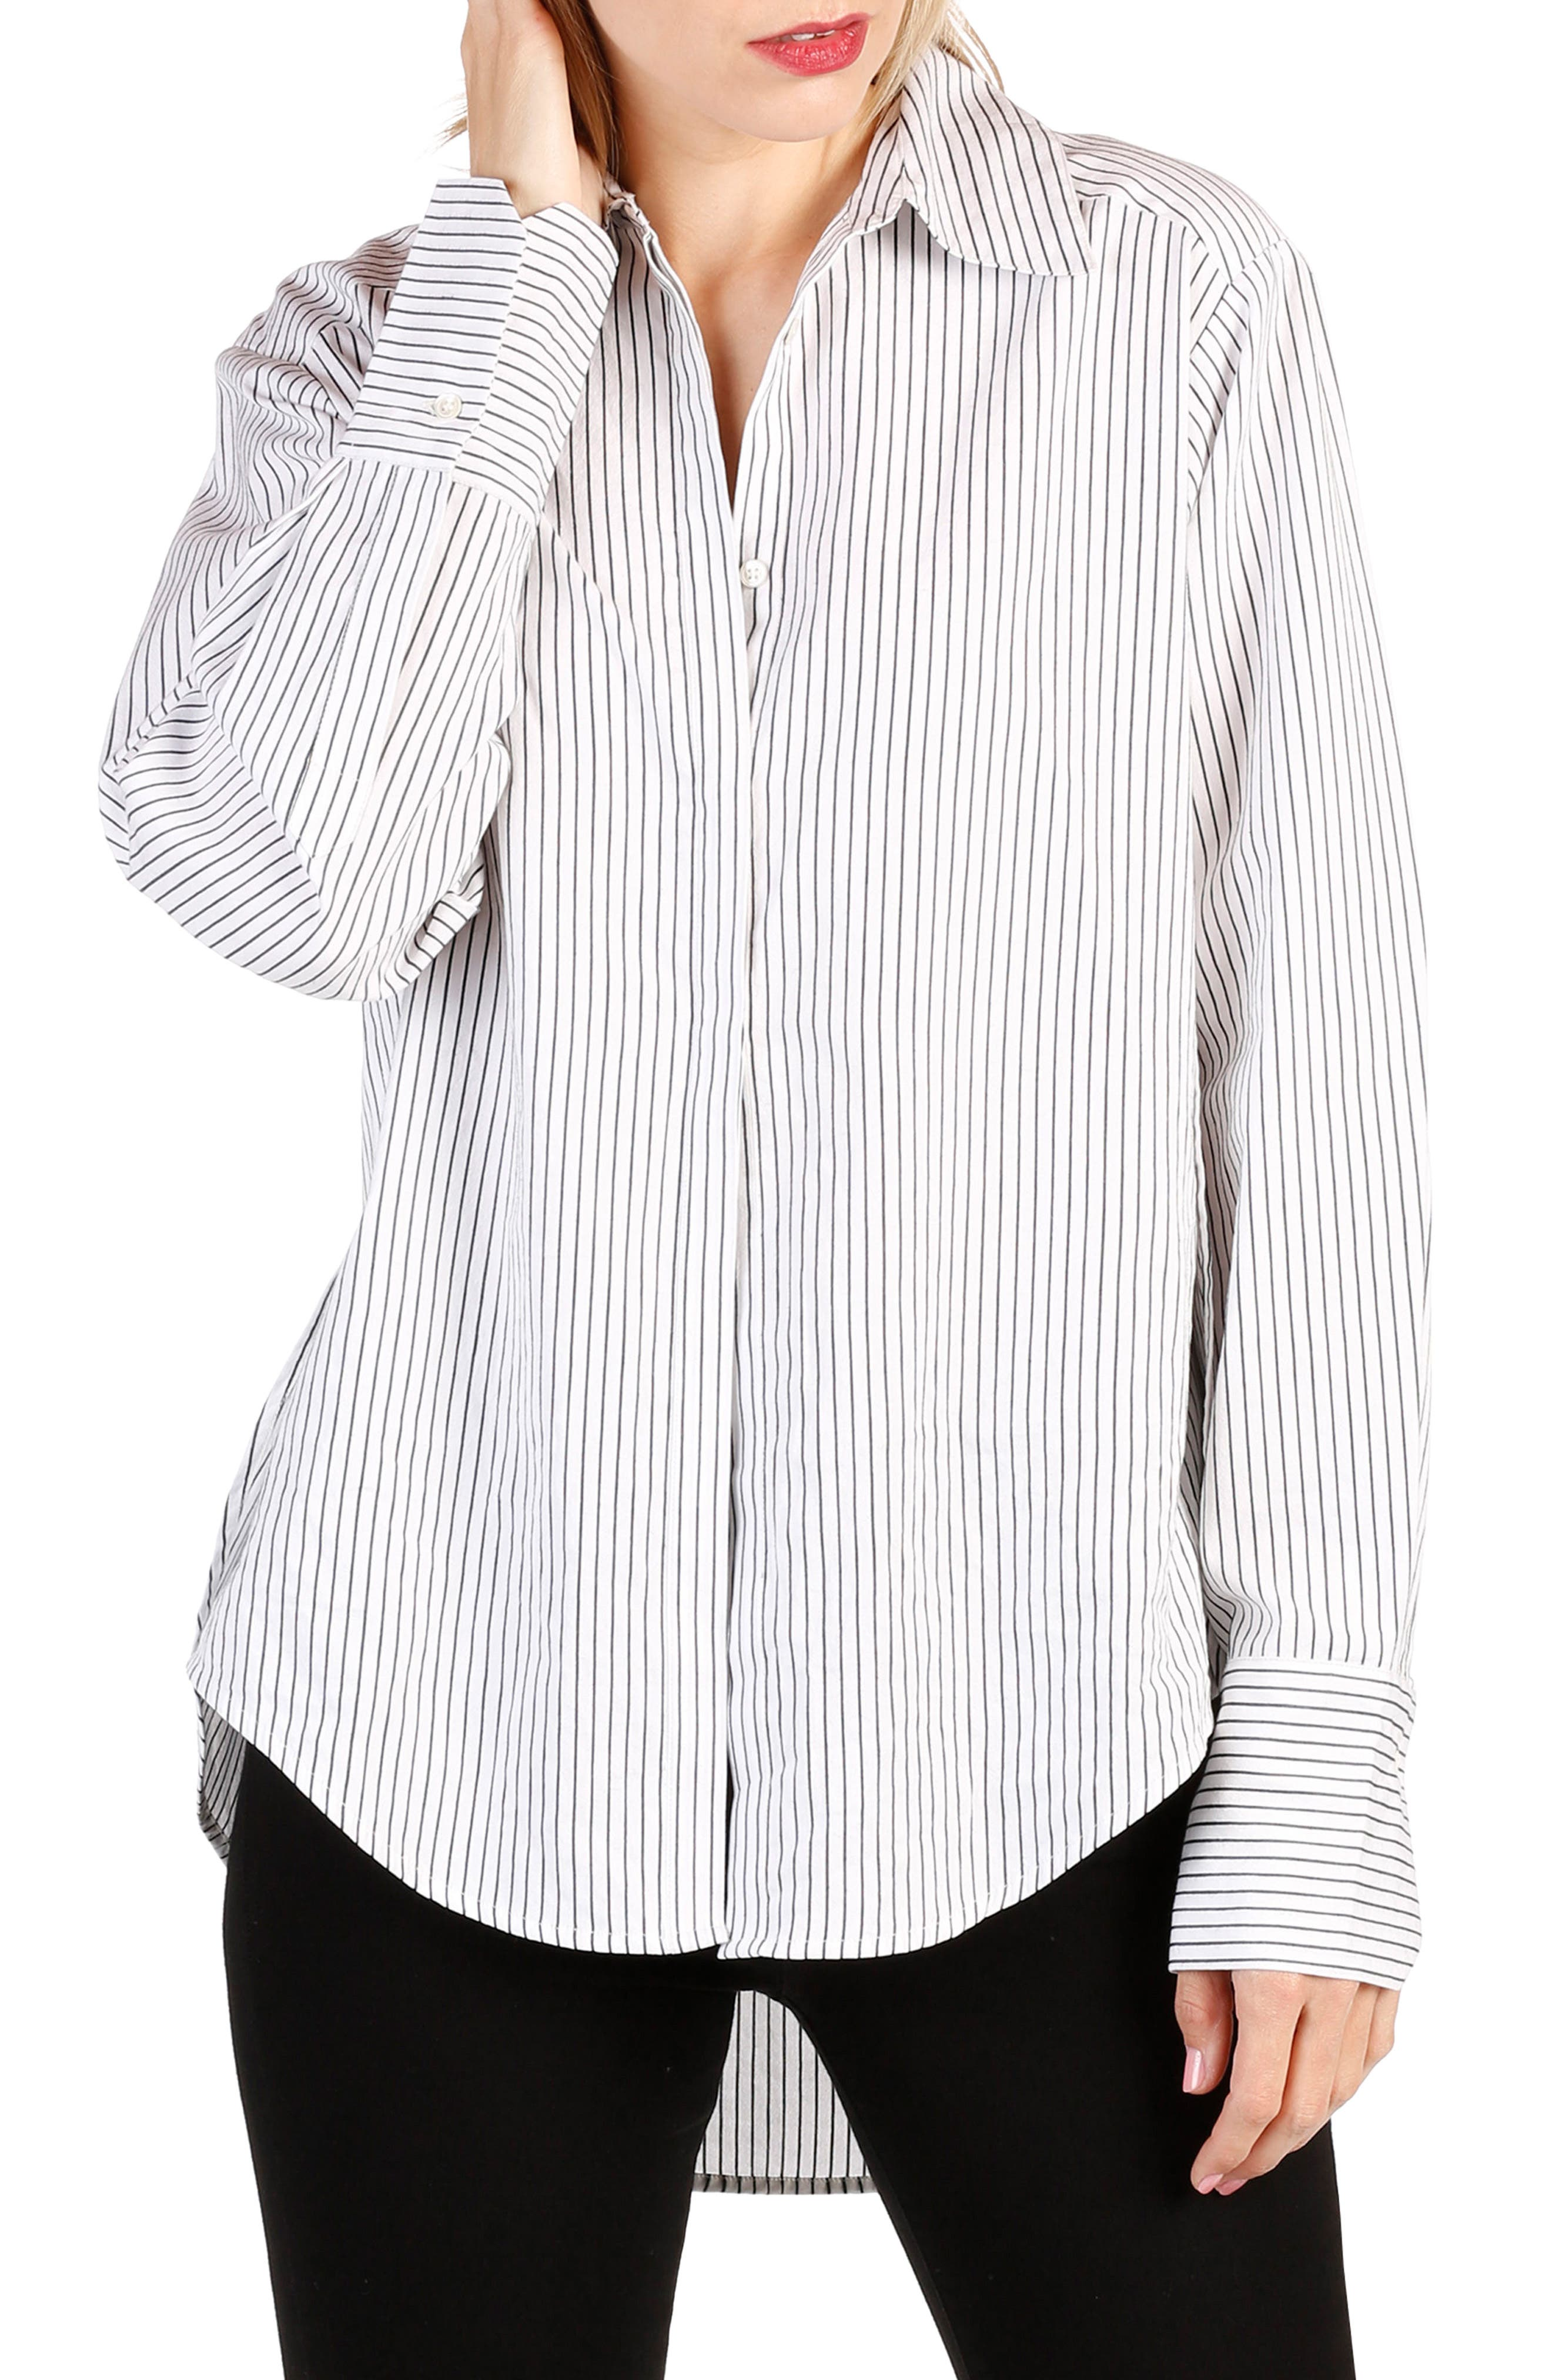 Clemence Stripe Shirt,                             Main thumbnail 1, color,                             Black And White Stripe